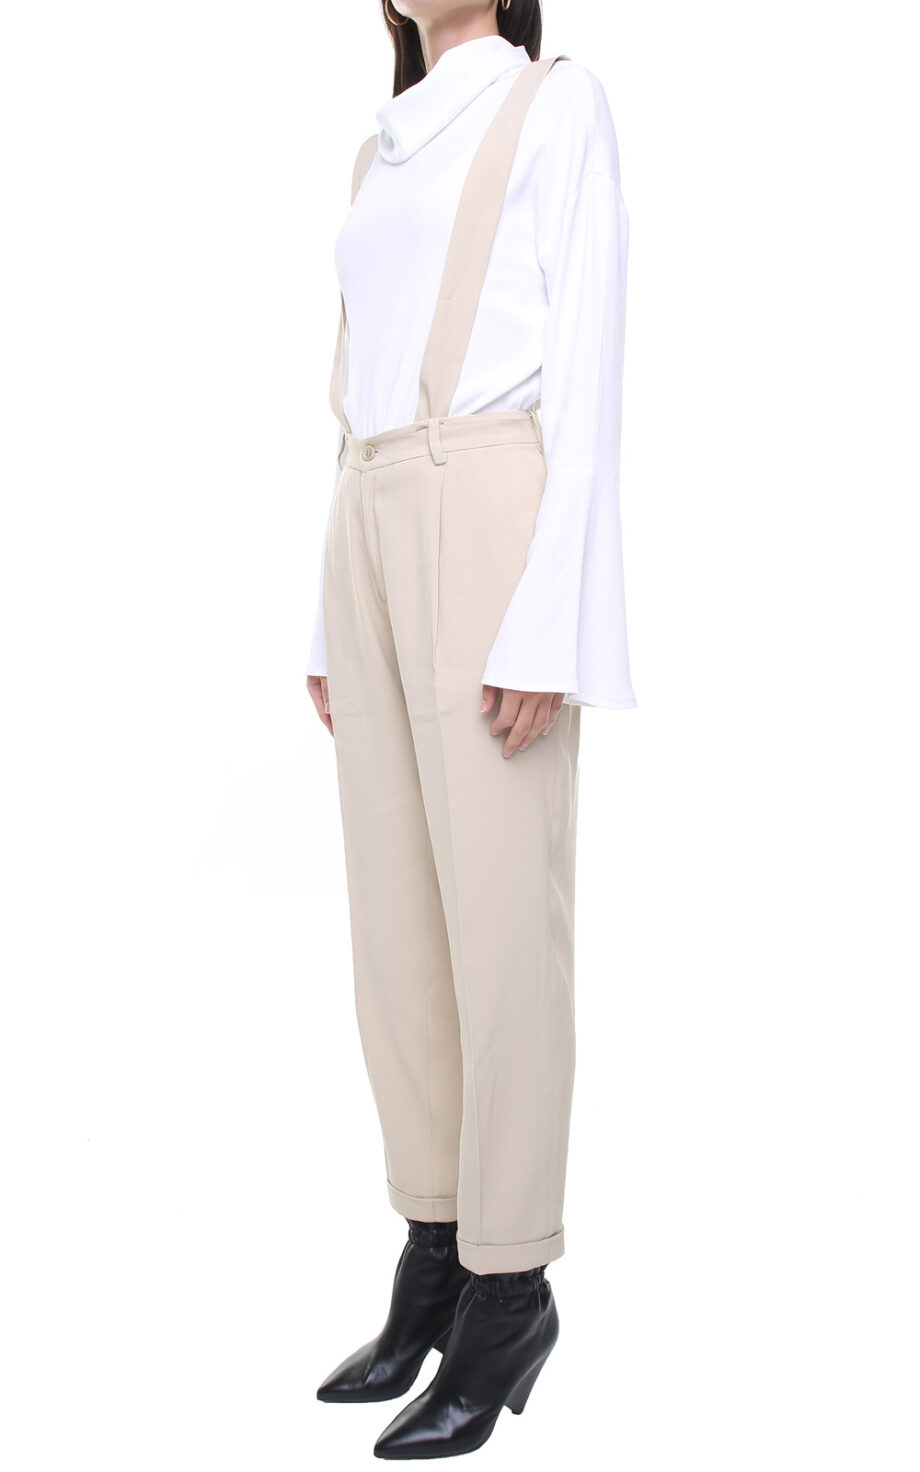 Jane trousers light beige w/ removable suspenders